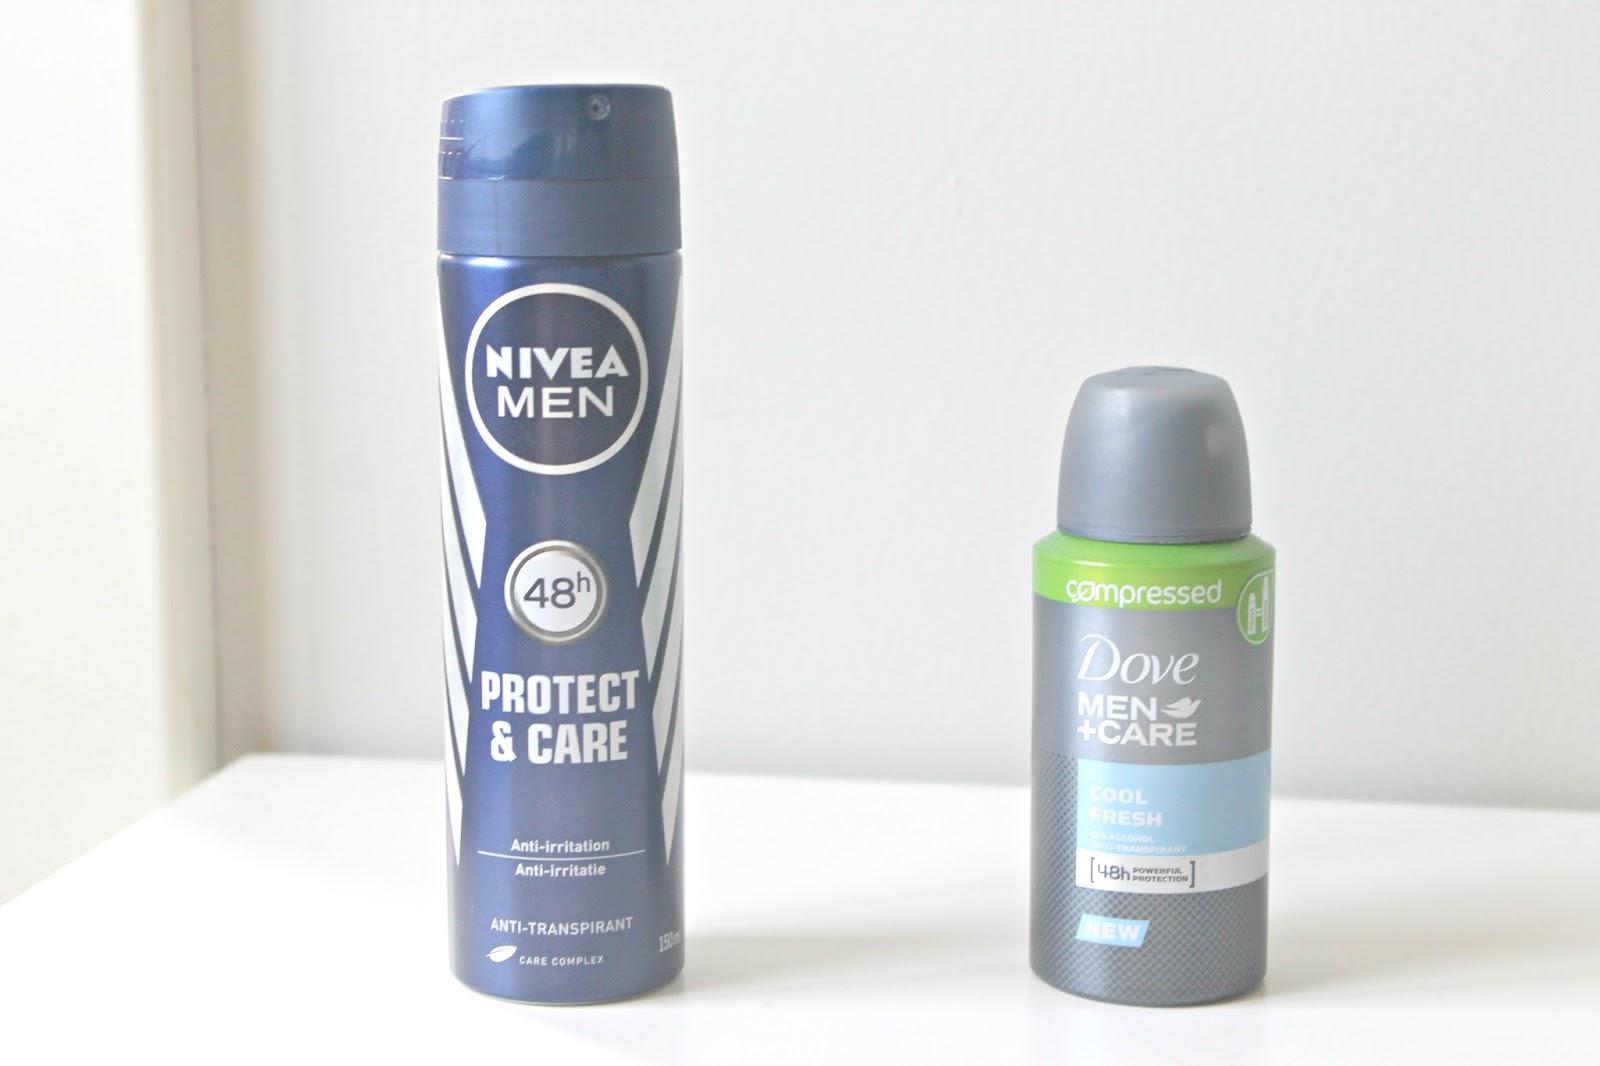 nivea men deodorant protect & care dove men care deodorant cool fresh